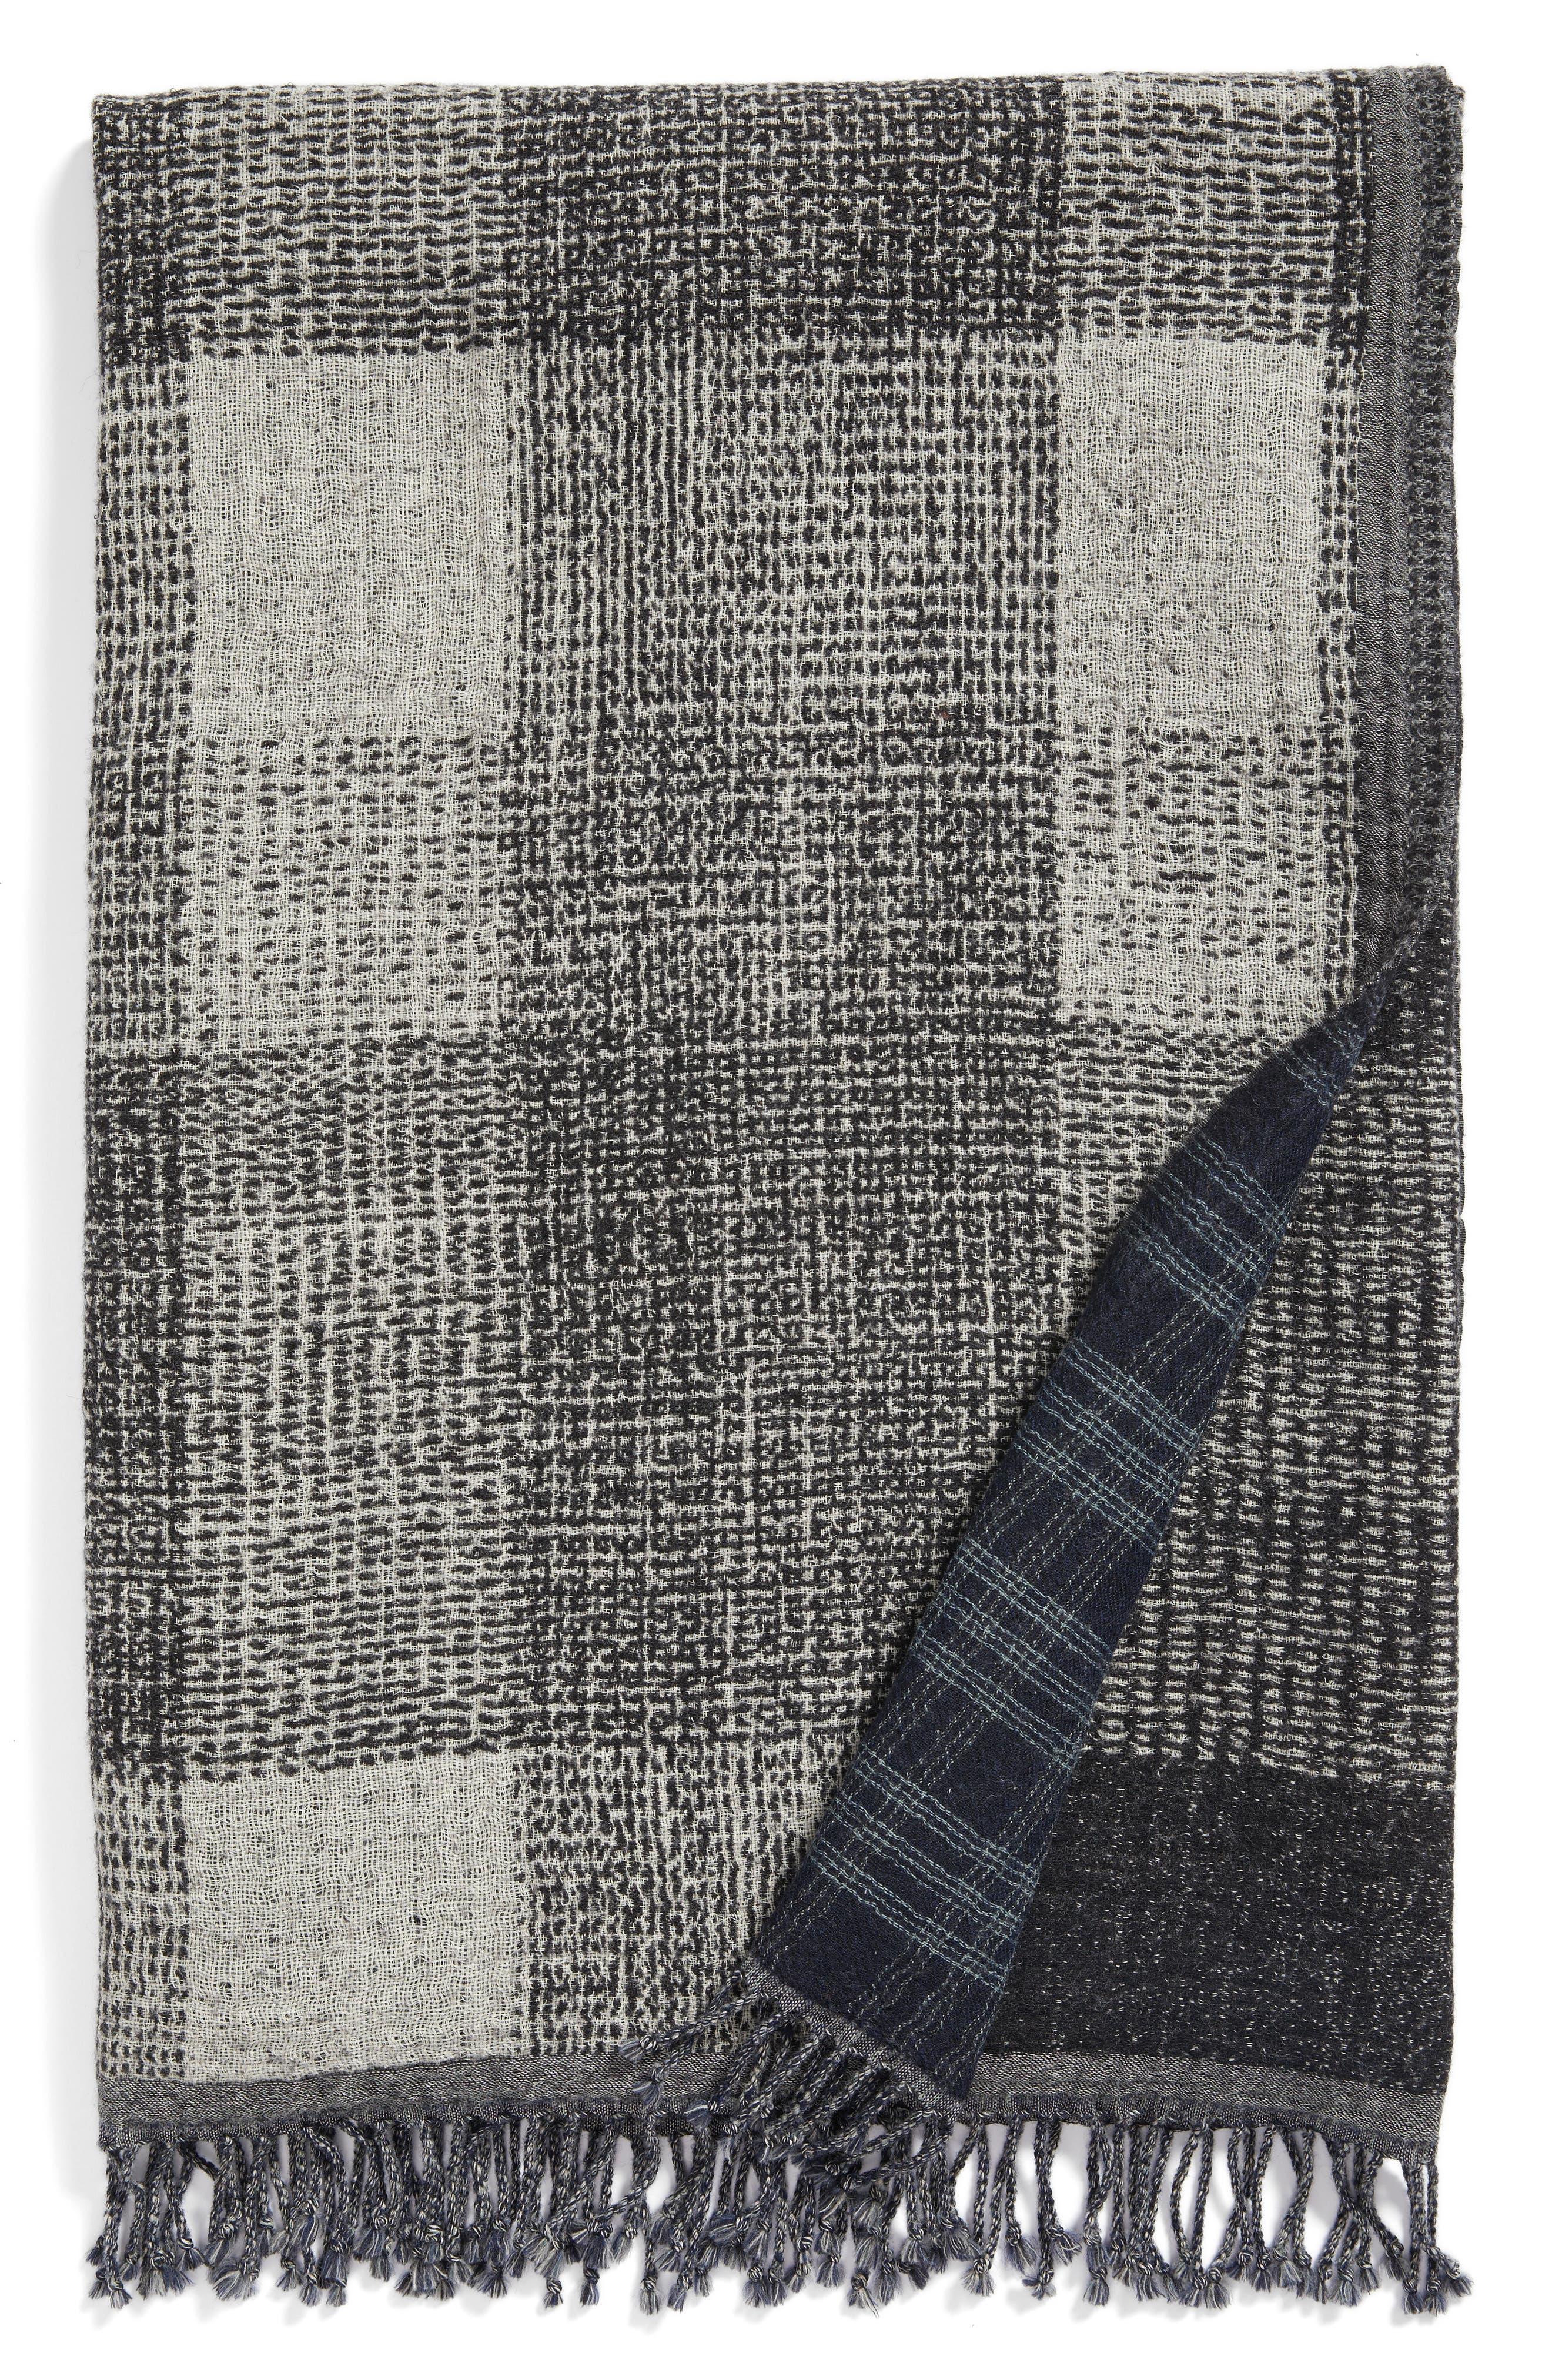 Deskloom Double Face Merino Wool Throw,                         Main,                         color, Deskloom